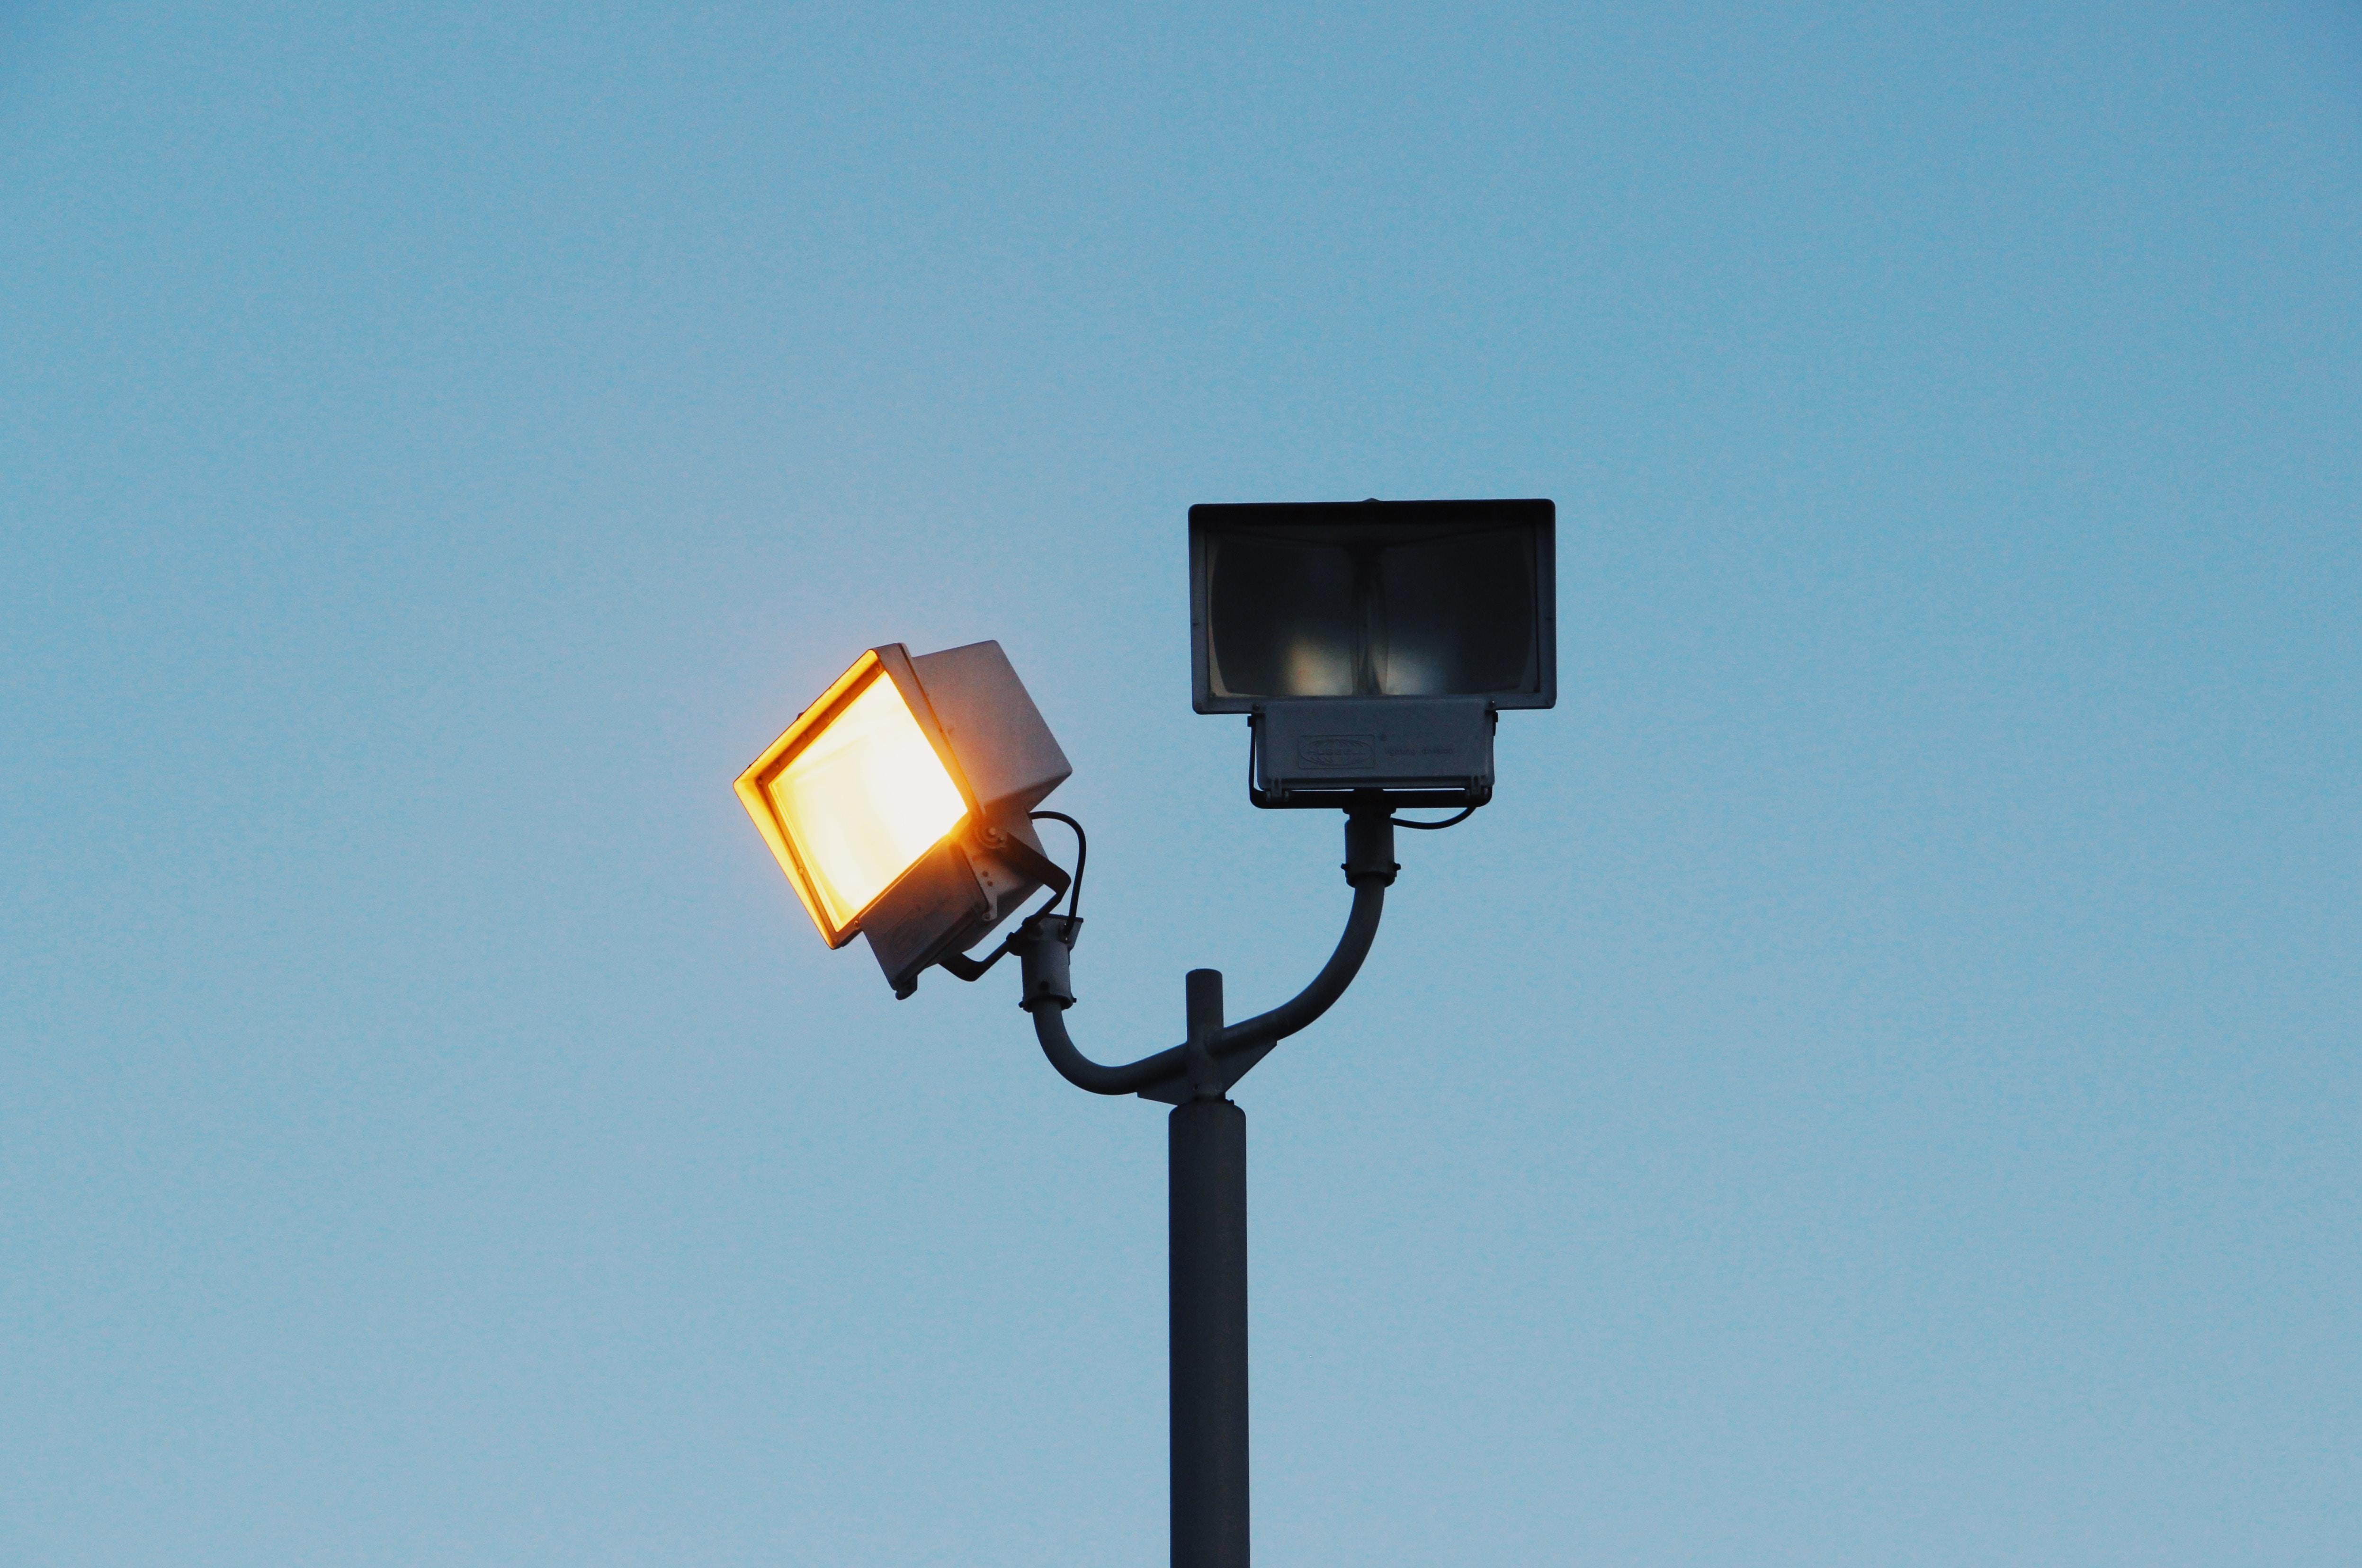 A rectangular spot light on a post next to another unlit lamp